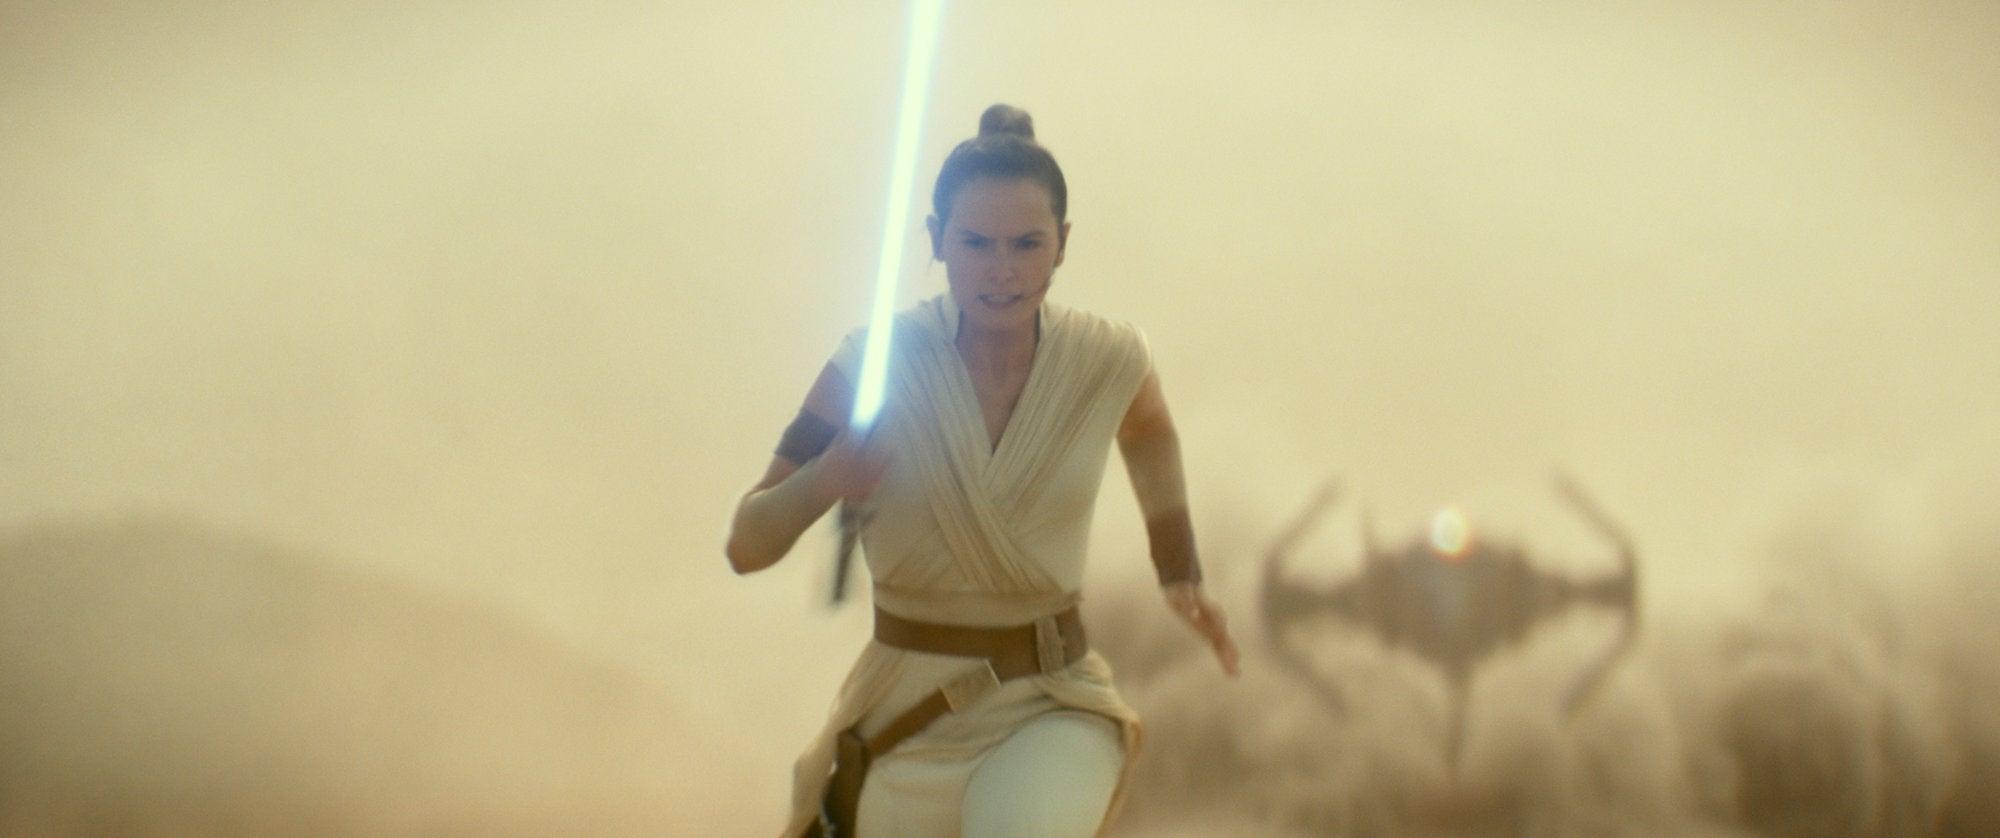 "Daisy Ridley in a scene from ""Rise of Skywalker"", 2019"